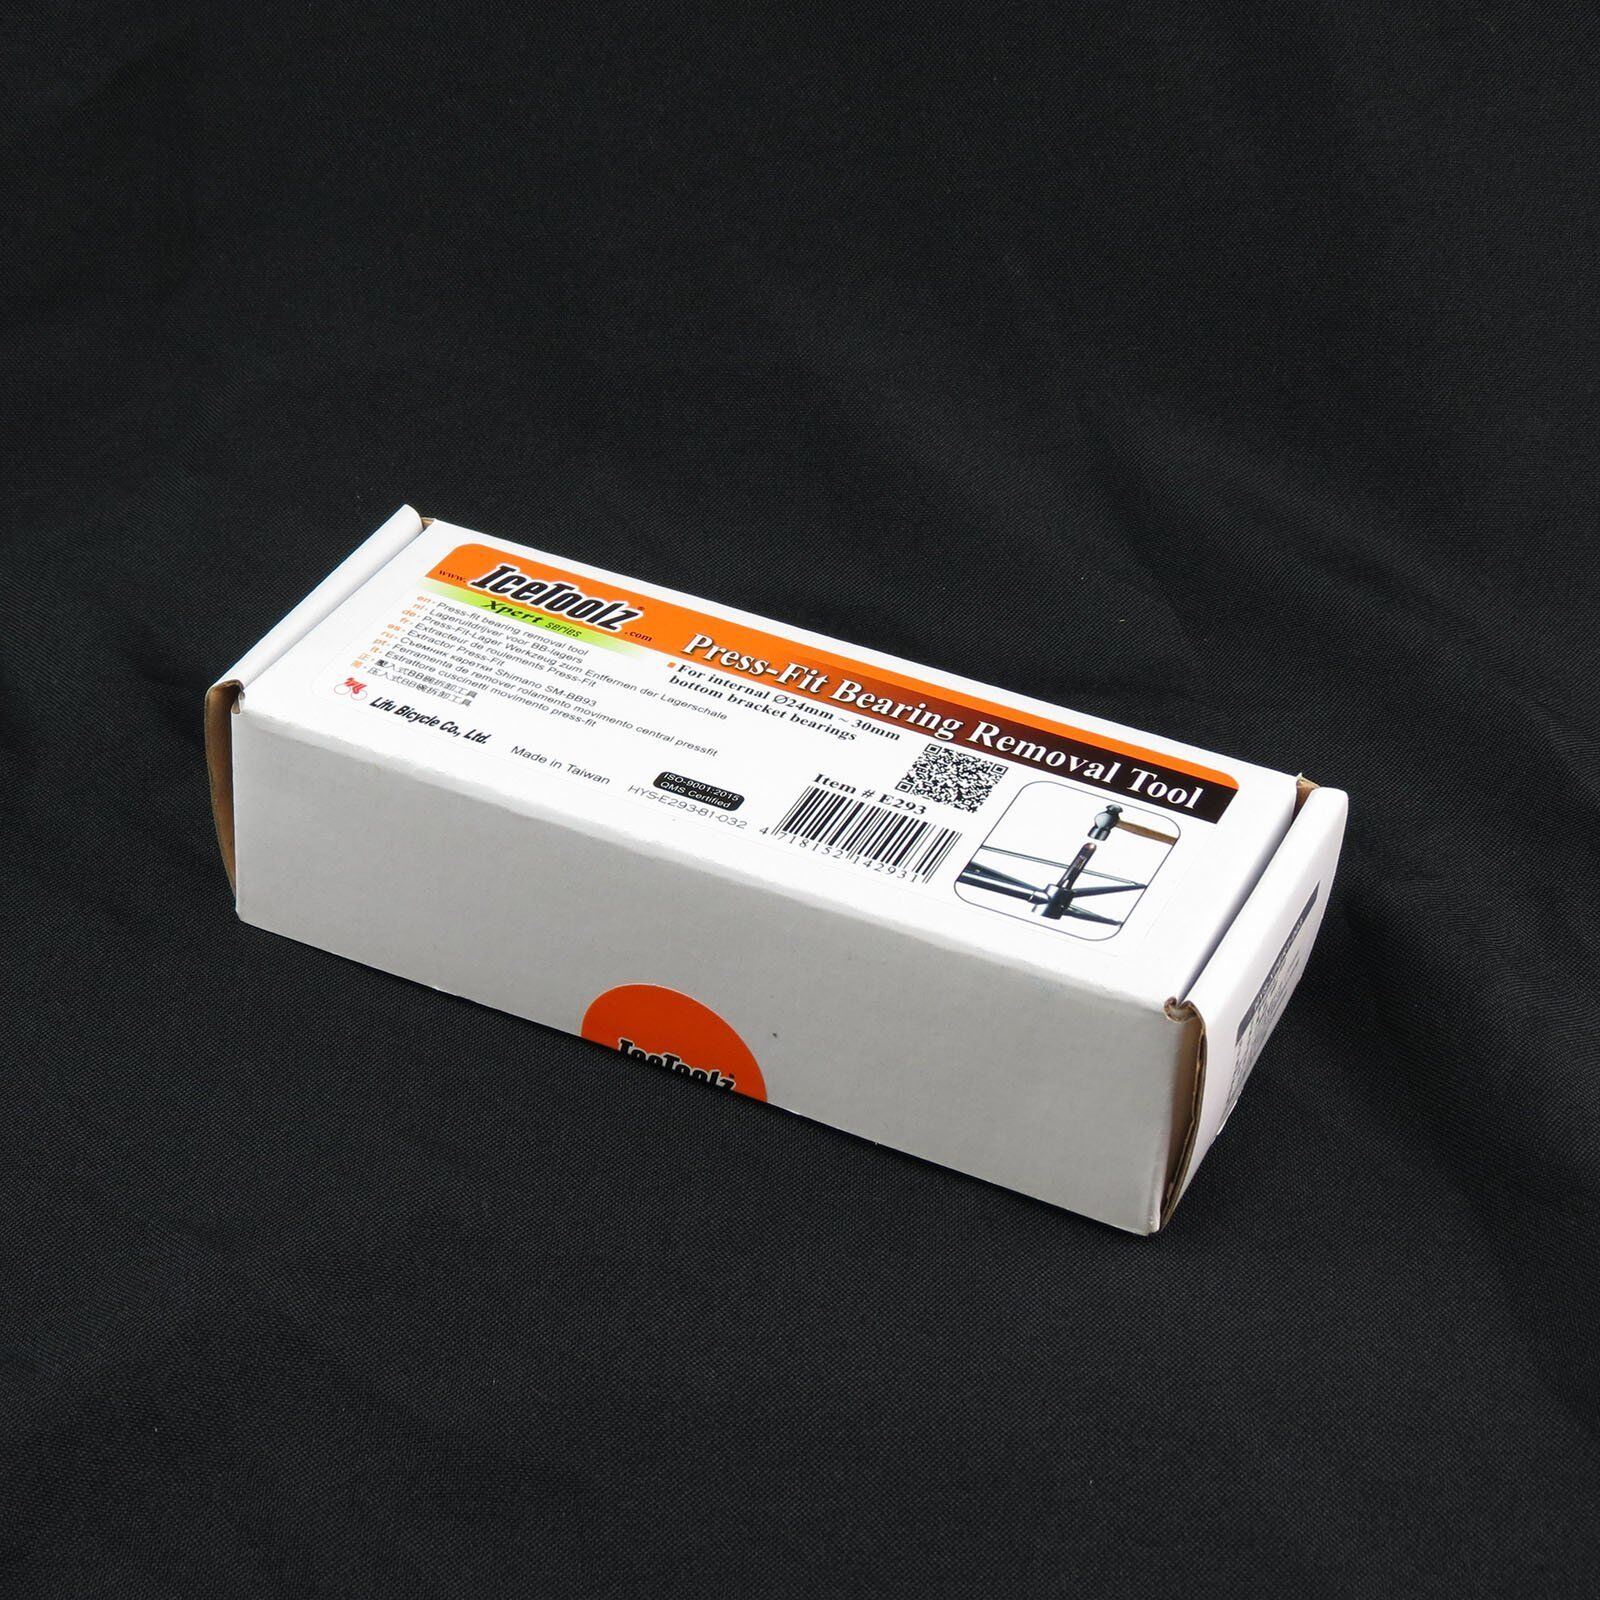 diameter 24-30mm IceToolz E293 Xpert Bike Press-fit Bearing Removal Tool